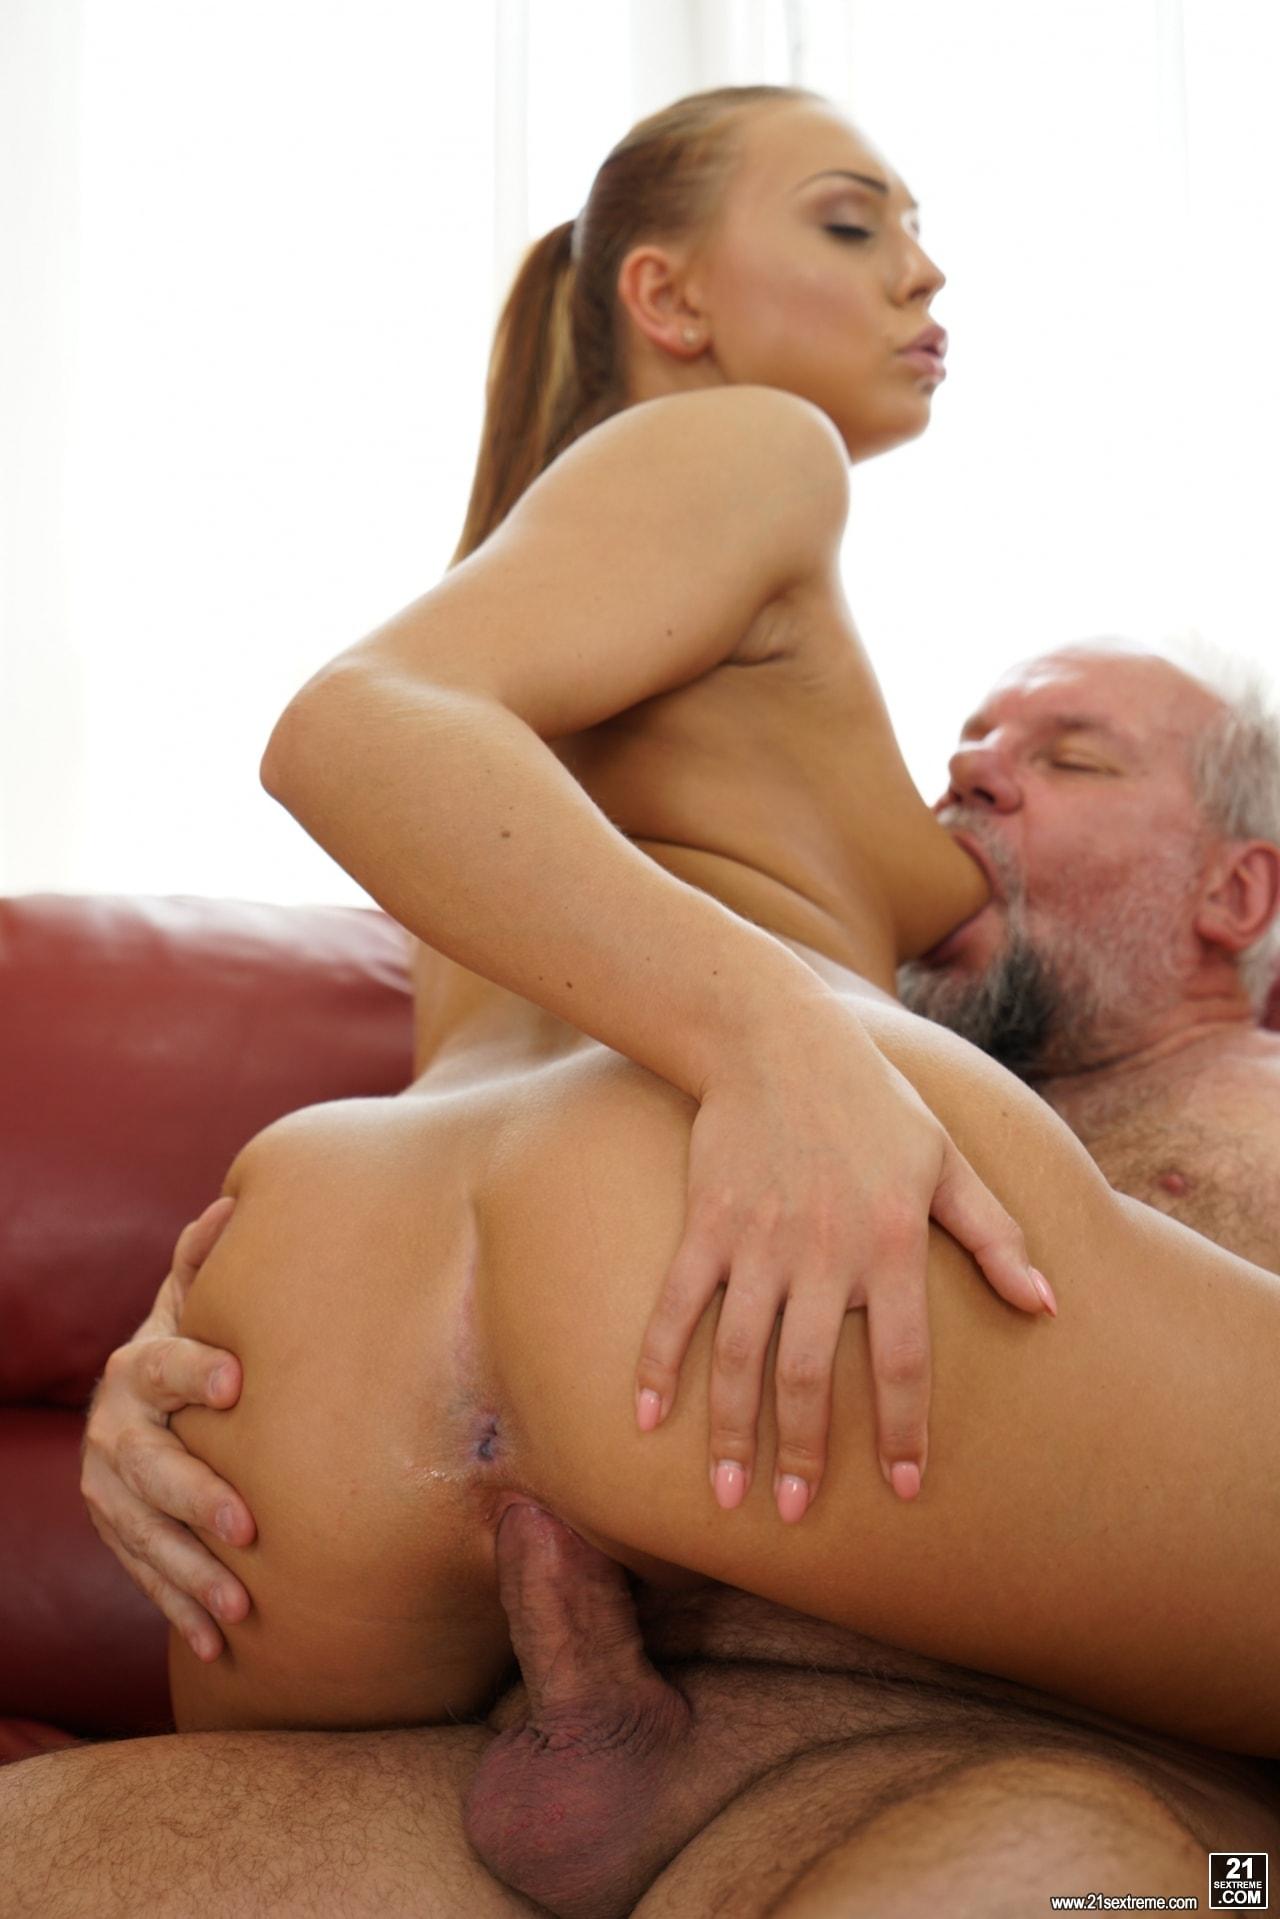 21Sextury 'Pleasing Naughty Grandpa' starring Ornella Morgan (Photo 253)